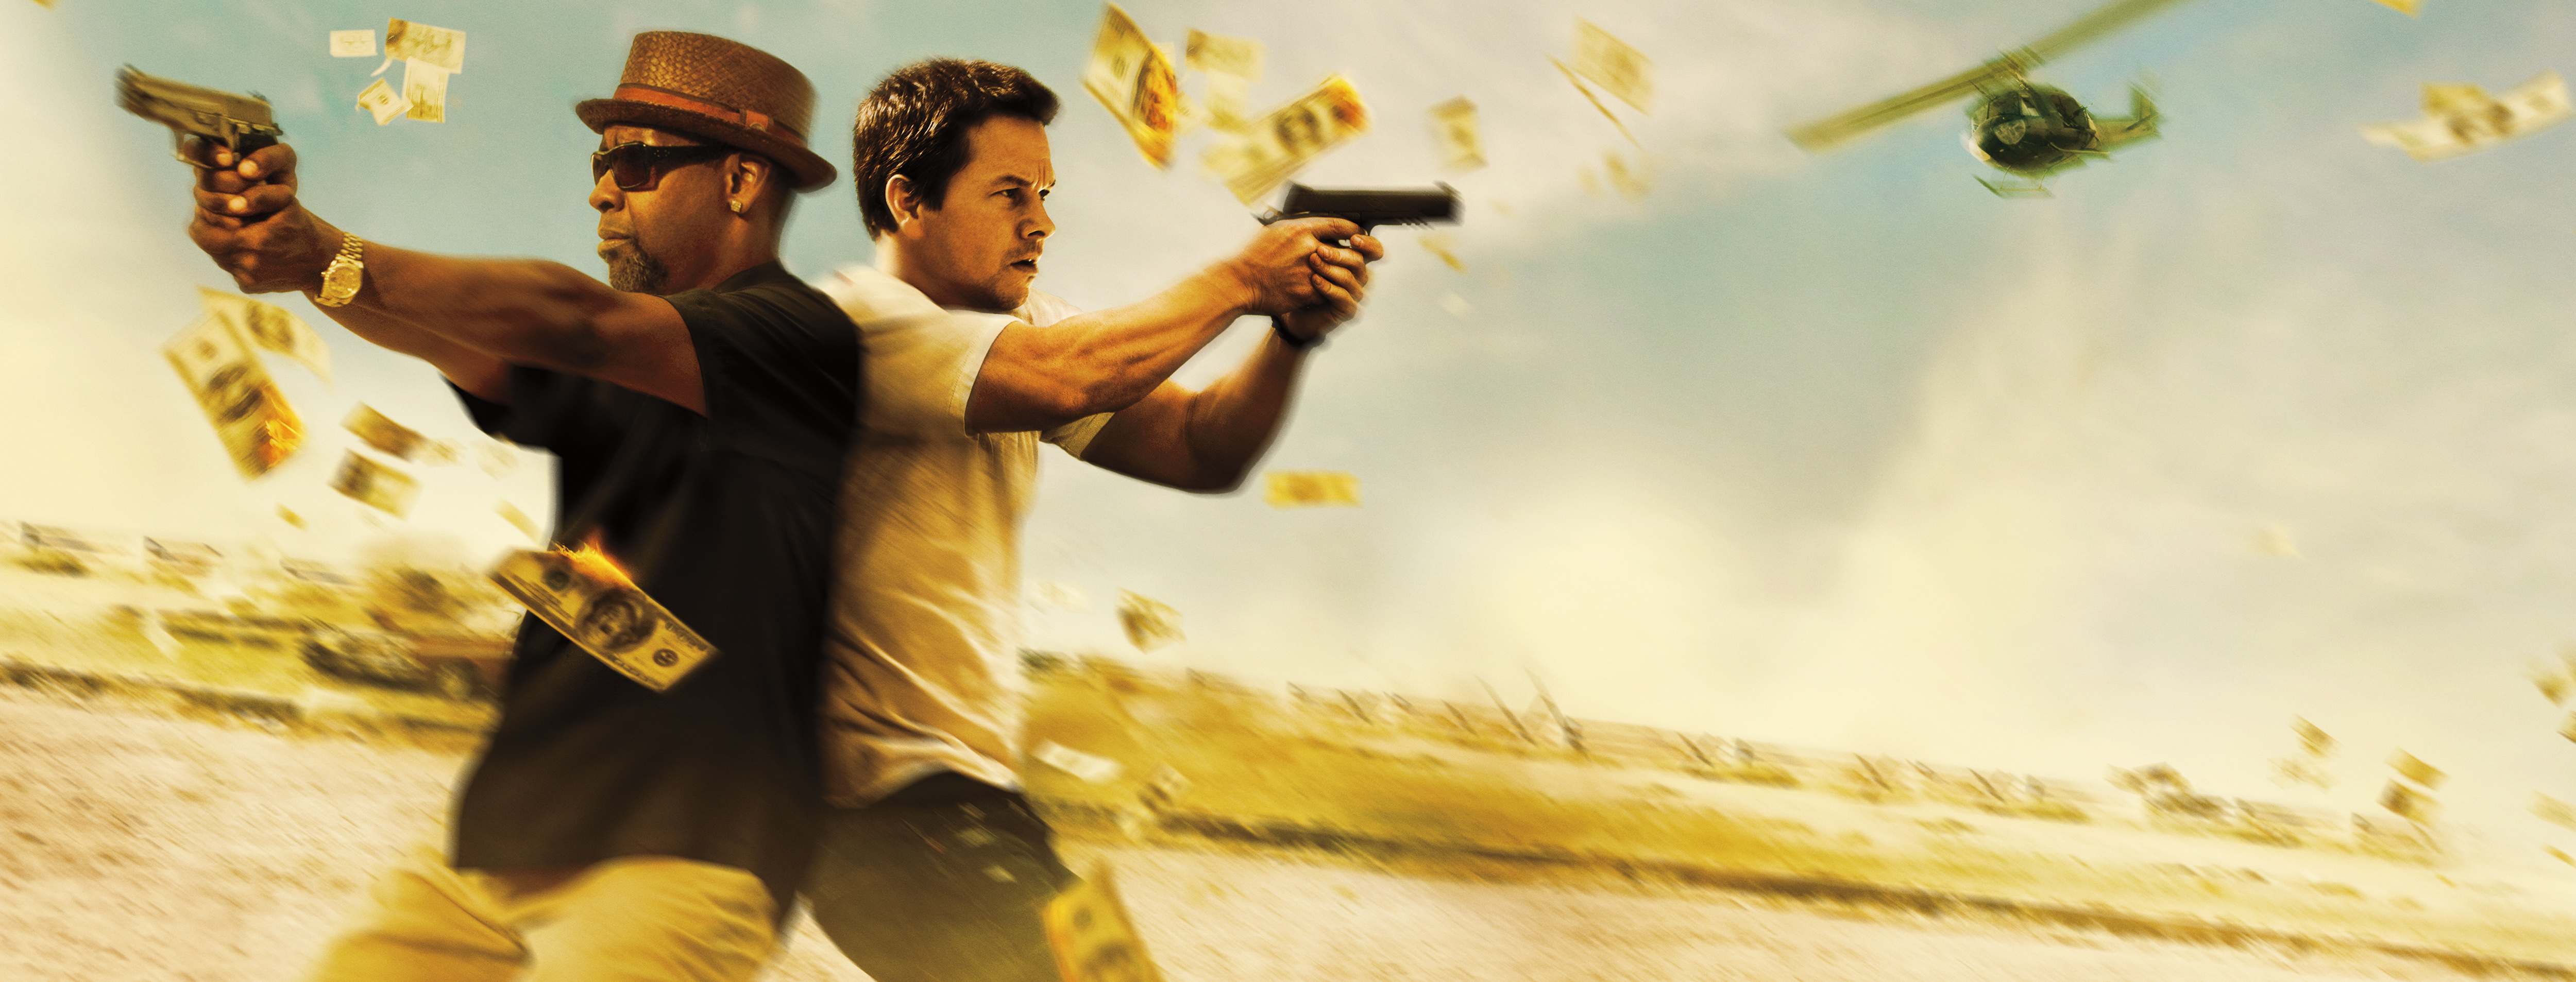 HQ 2 Guns Wallpapers | File 2987.56Kb